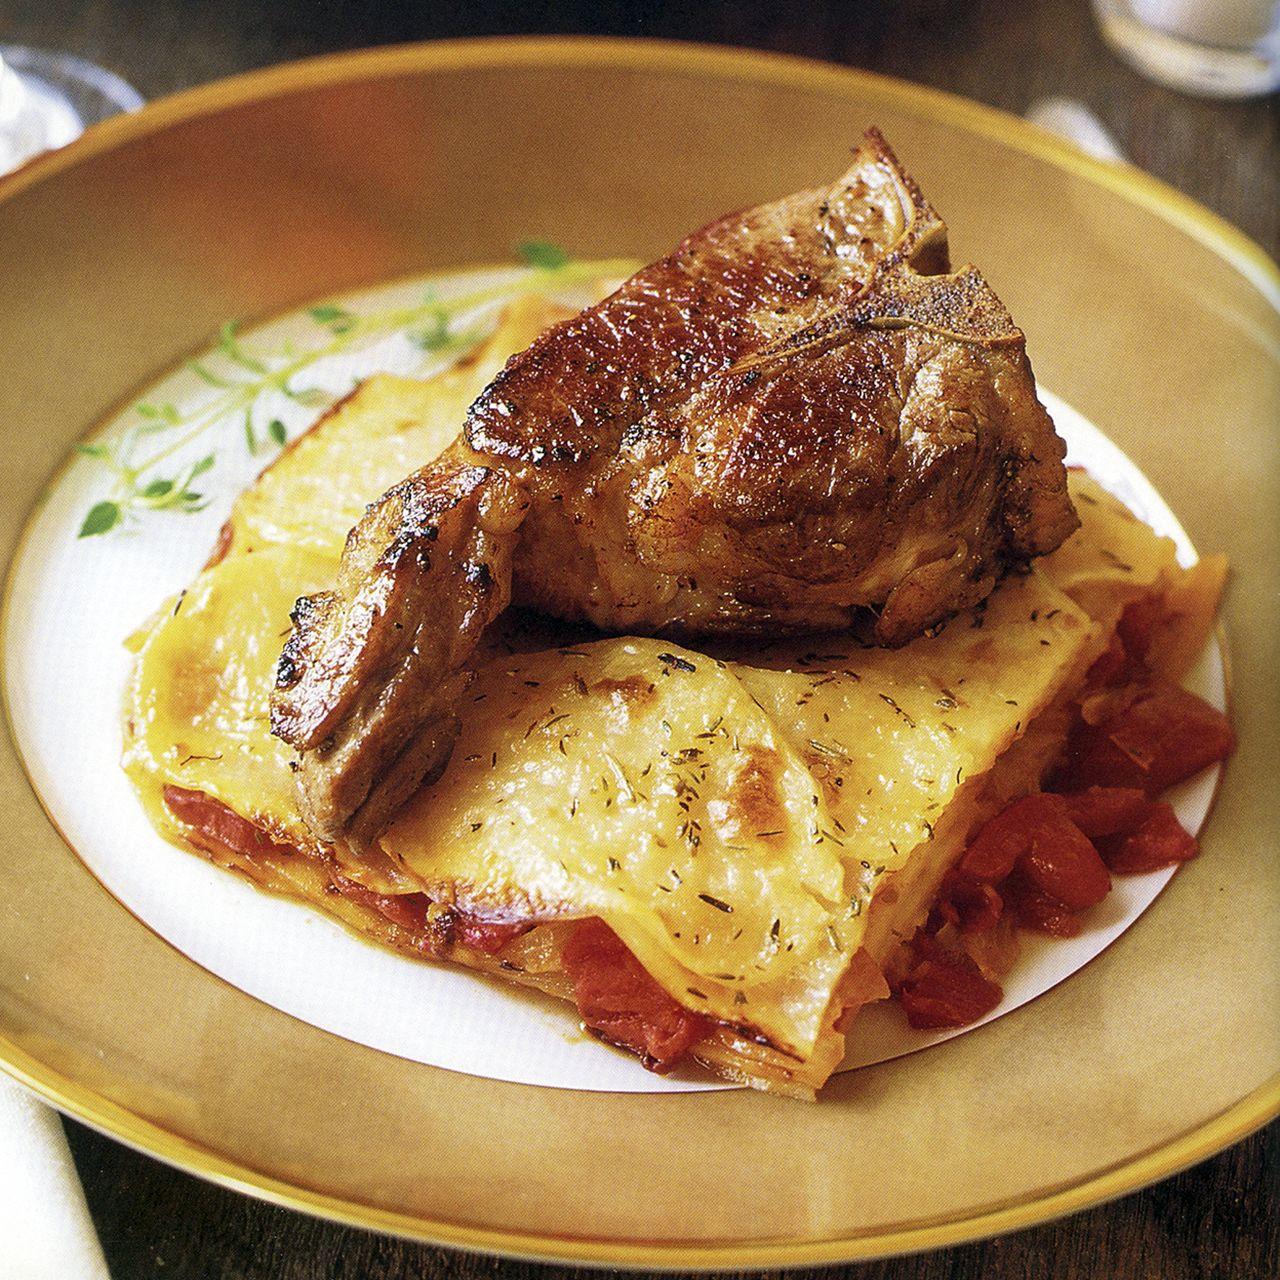 Lamb Chops with Tomato-and-Potato Gratin